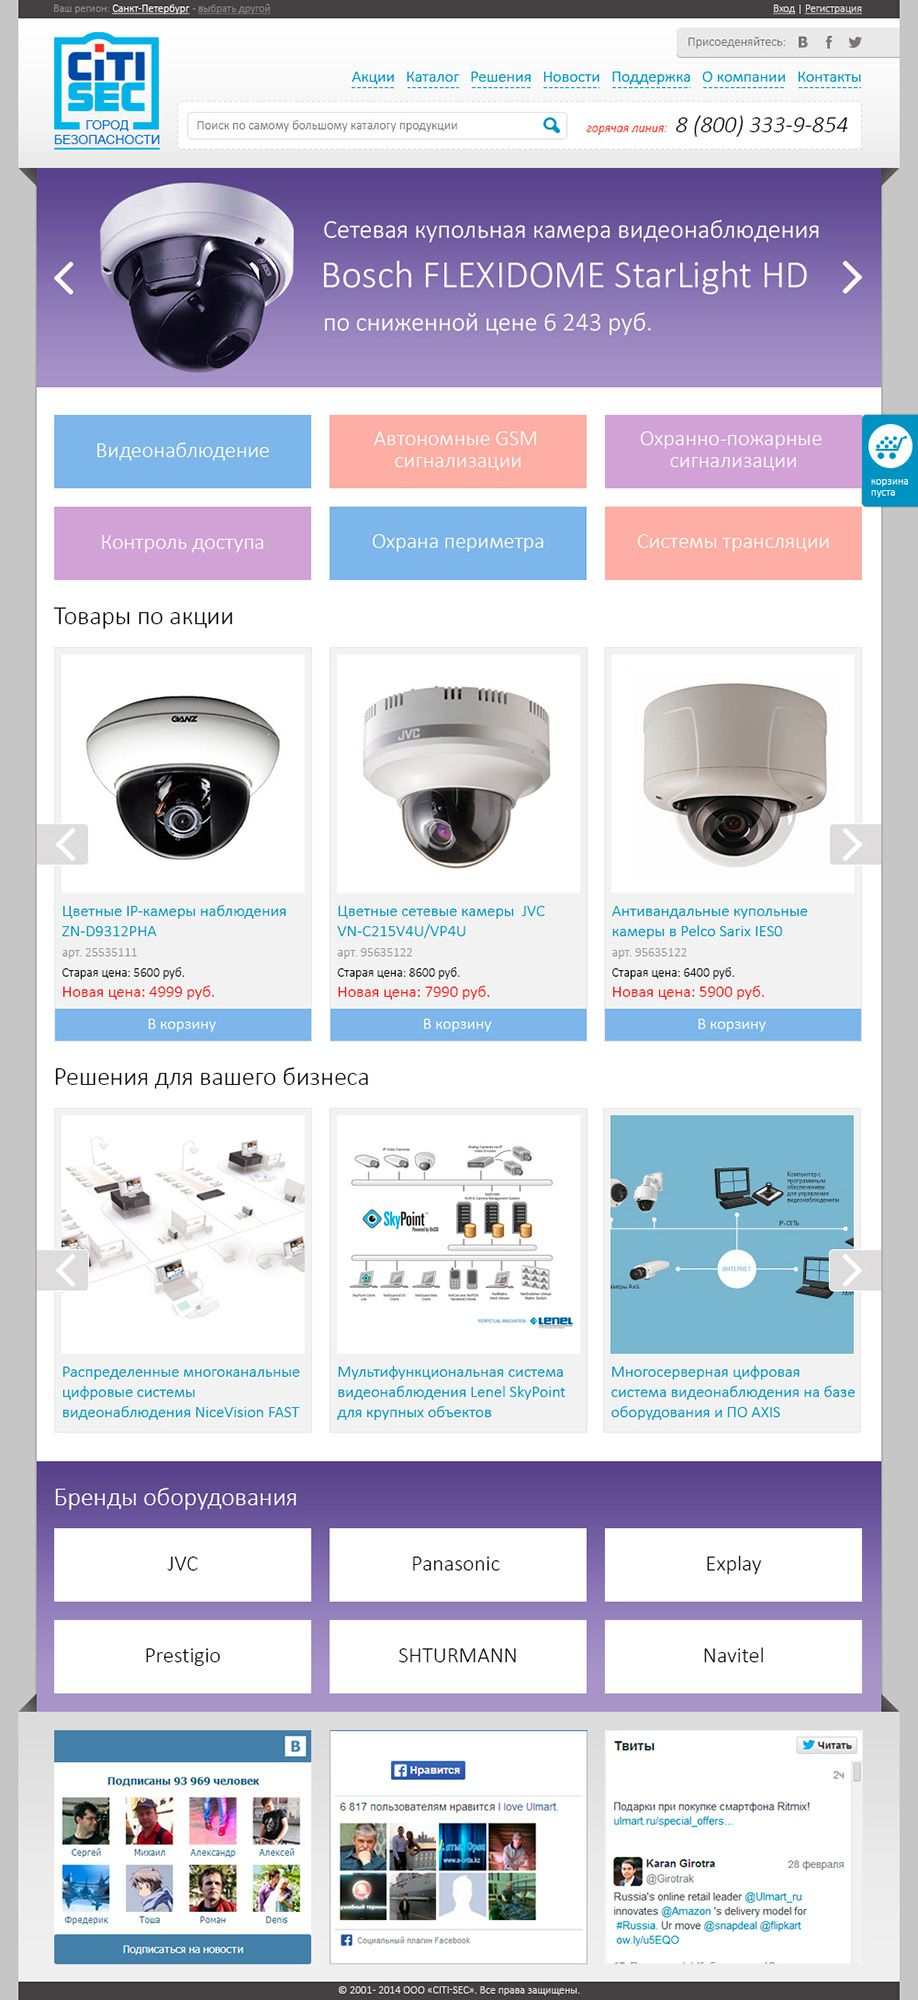 Дизайн интернет-магазина\сайта citi-sec.ru - дизайнер kasya_82